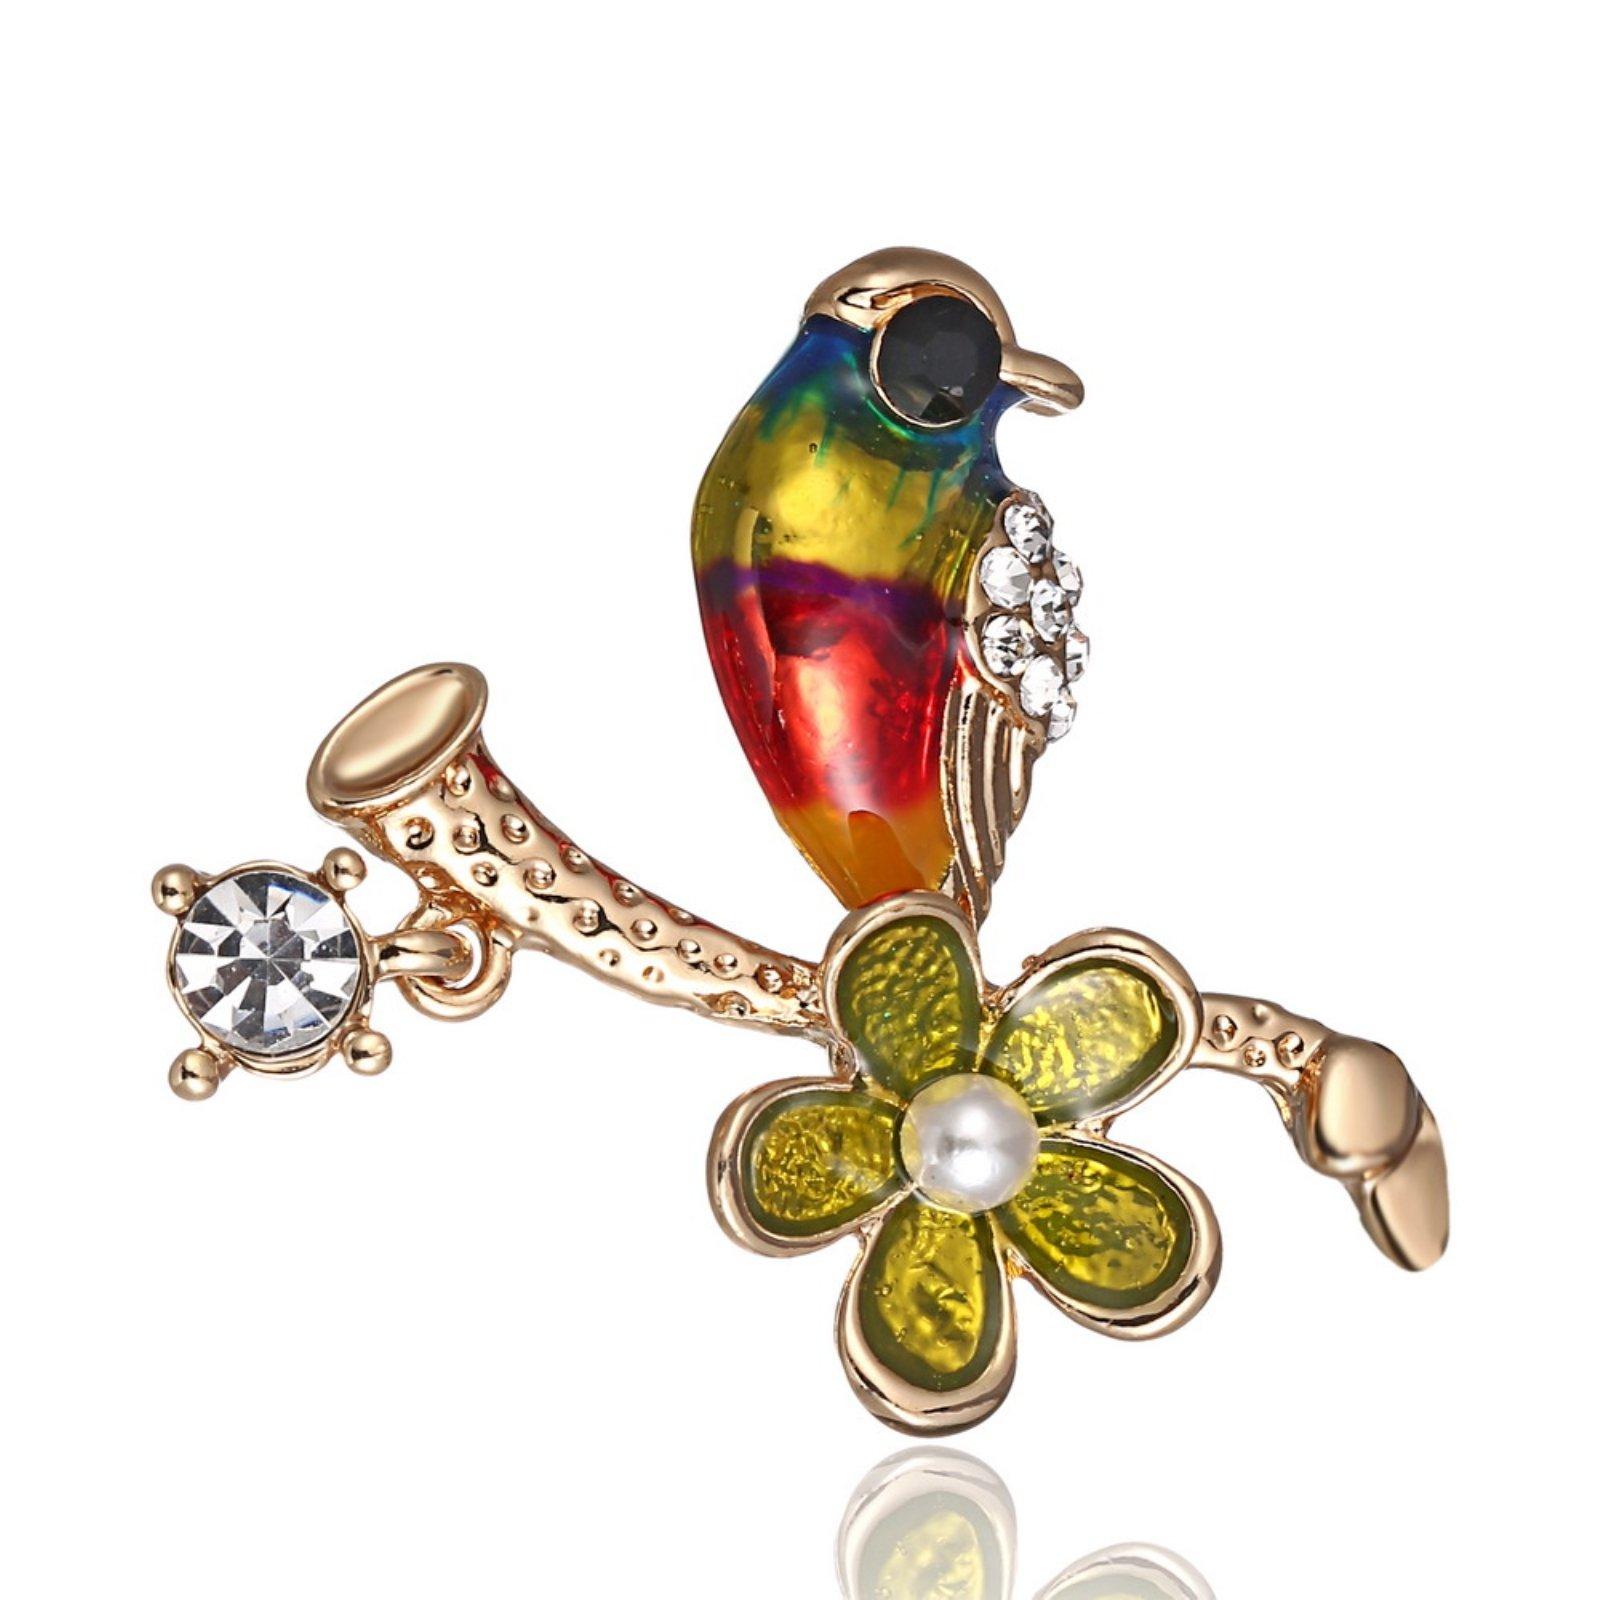 ptk12 Women Decoration Wild Animal Fashion Gold Jewelry Rhinestone Colorful Bird Brooch Animal by ptk12